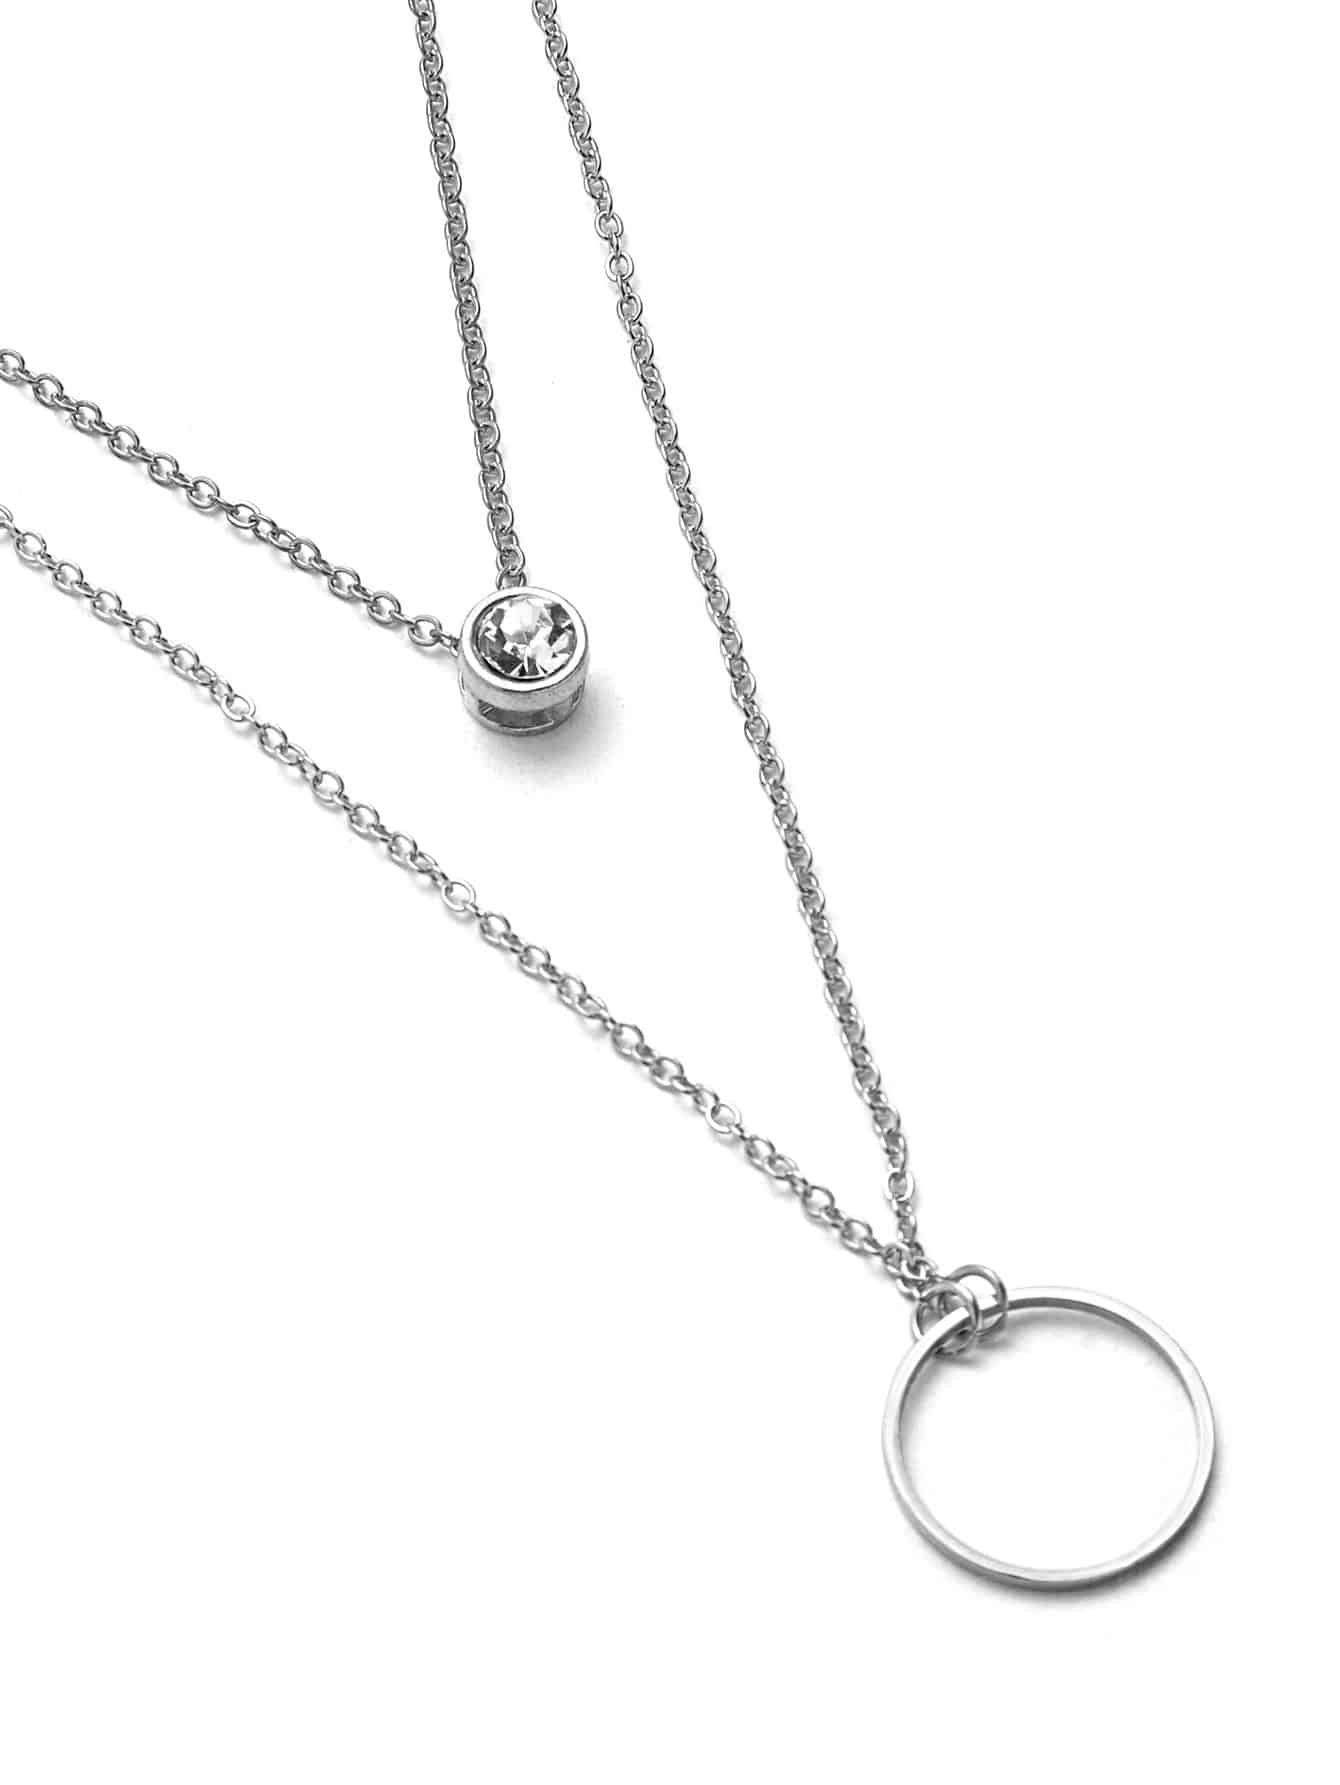 Rhinestone Detail Ring Pendant Layered Necklace rhinestone detail layered rings set 3pcs